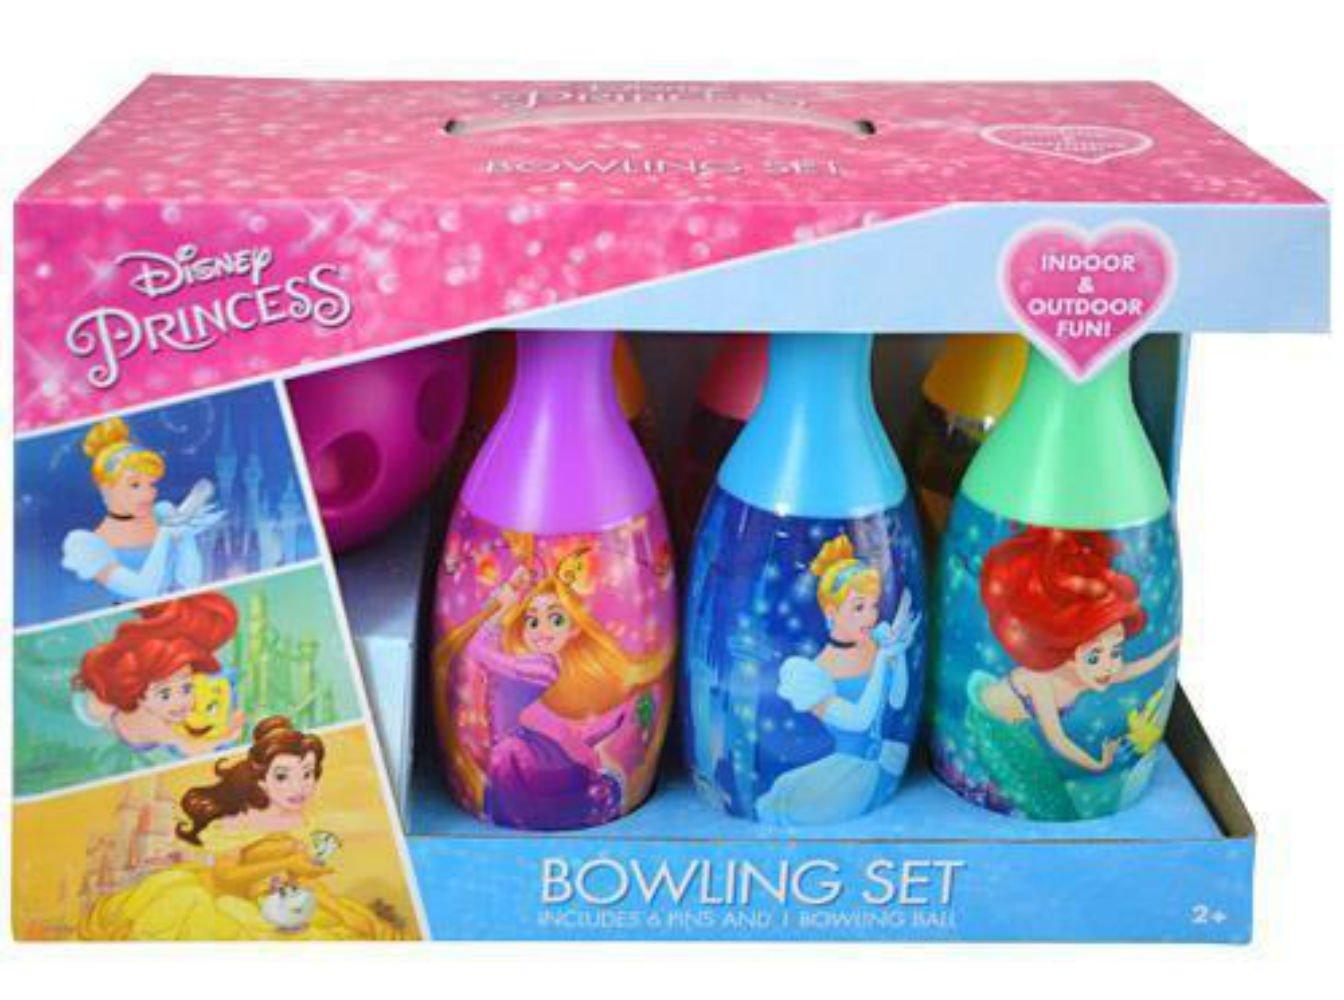 Disney Princess Themed Kids Bowling Play Set